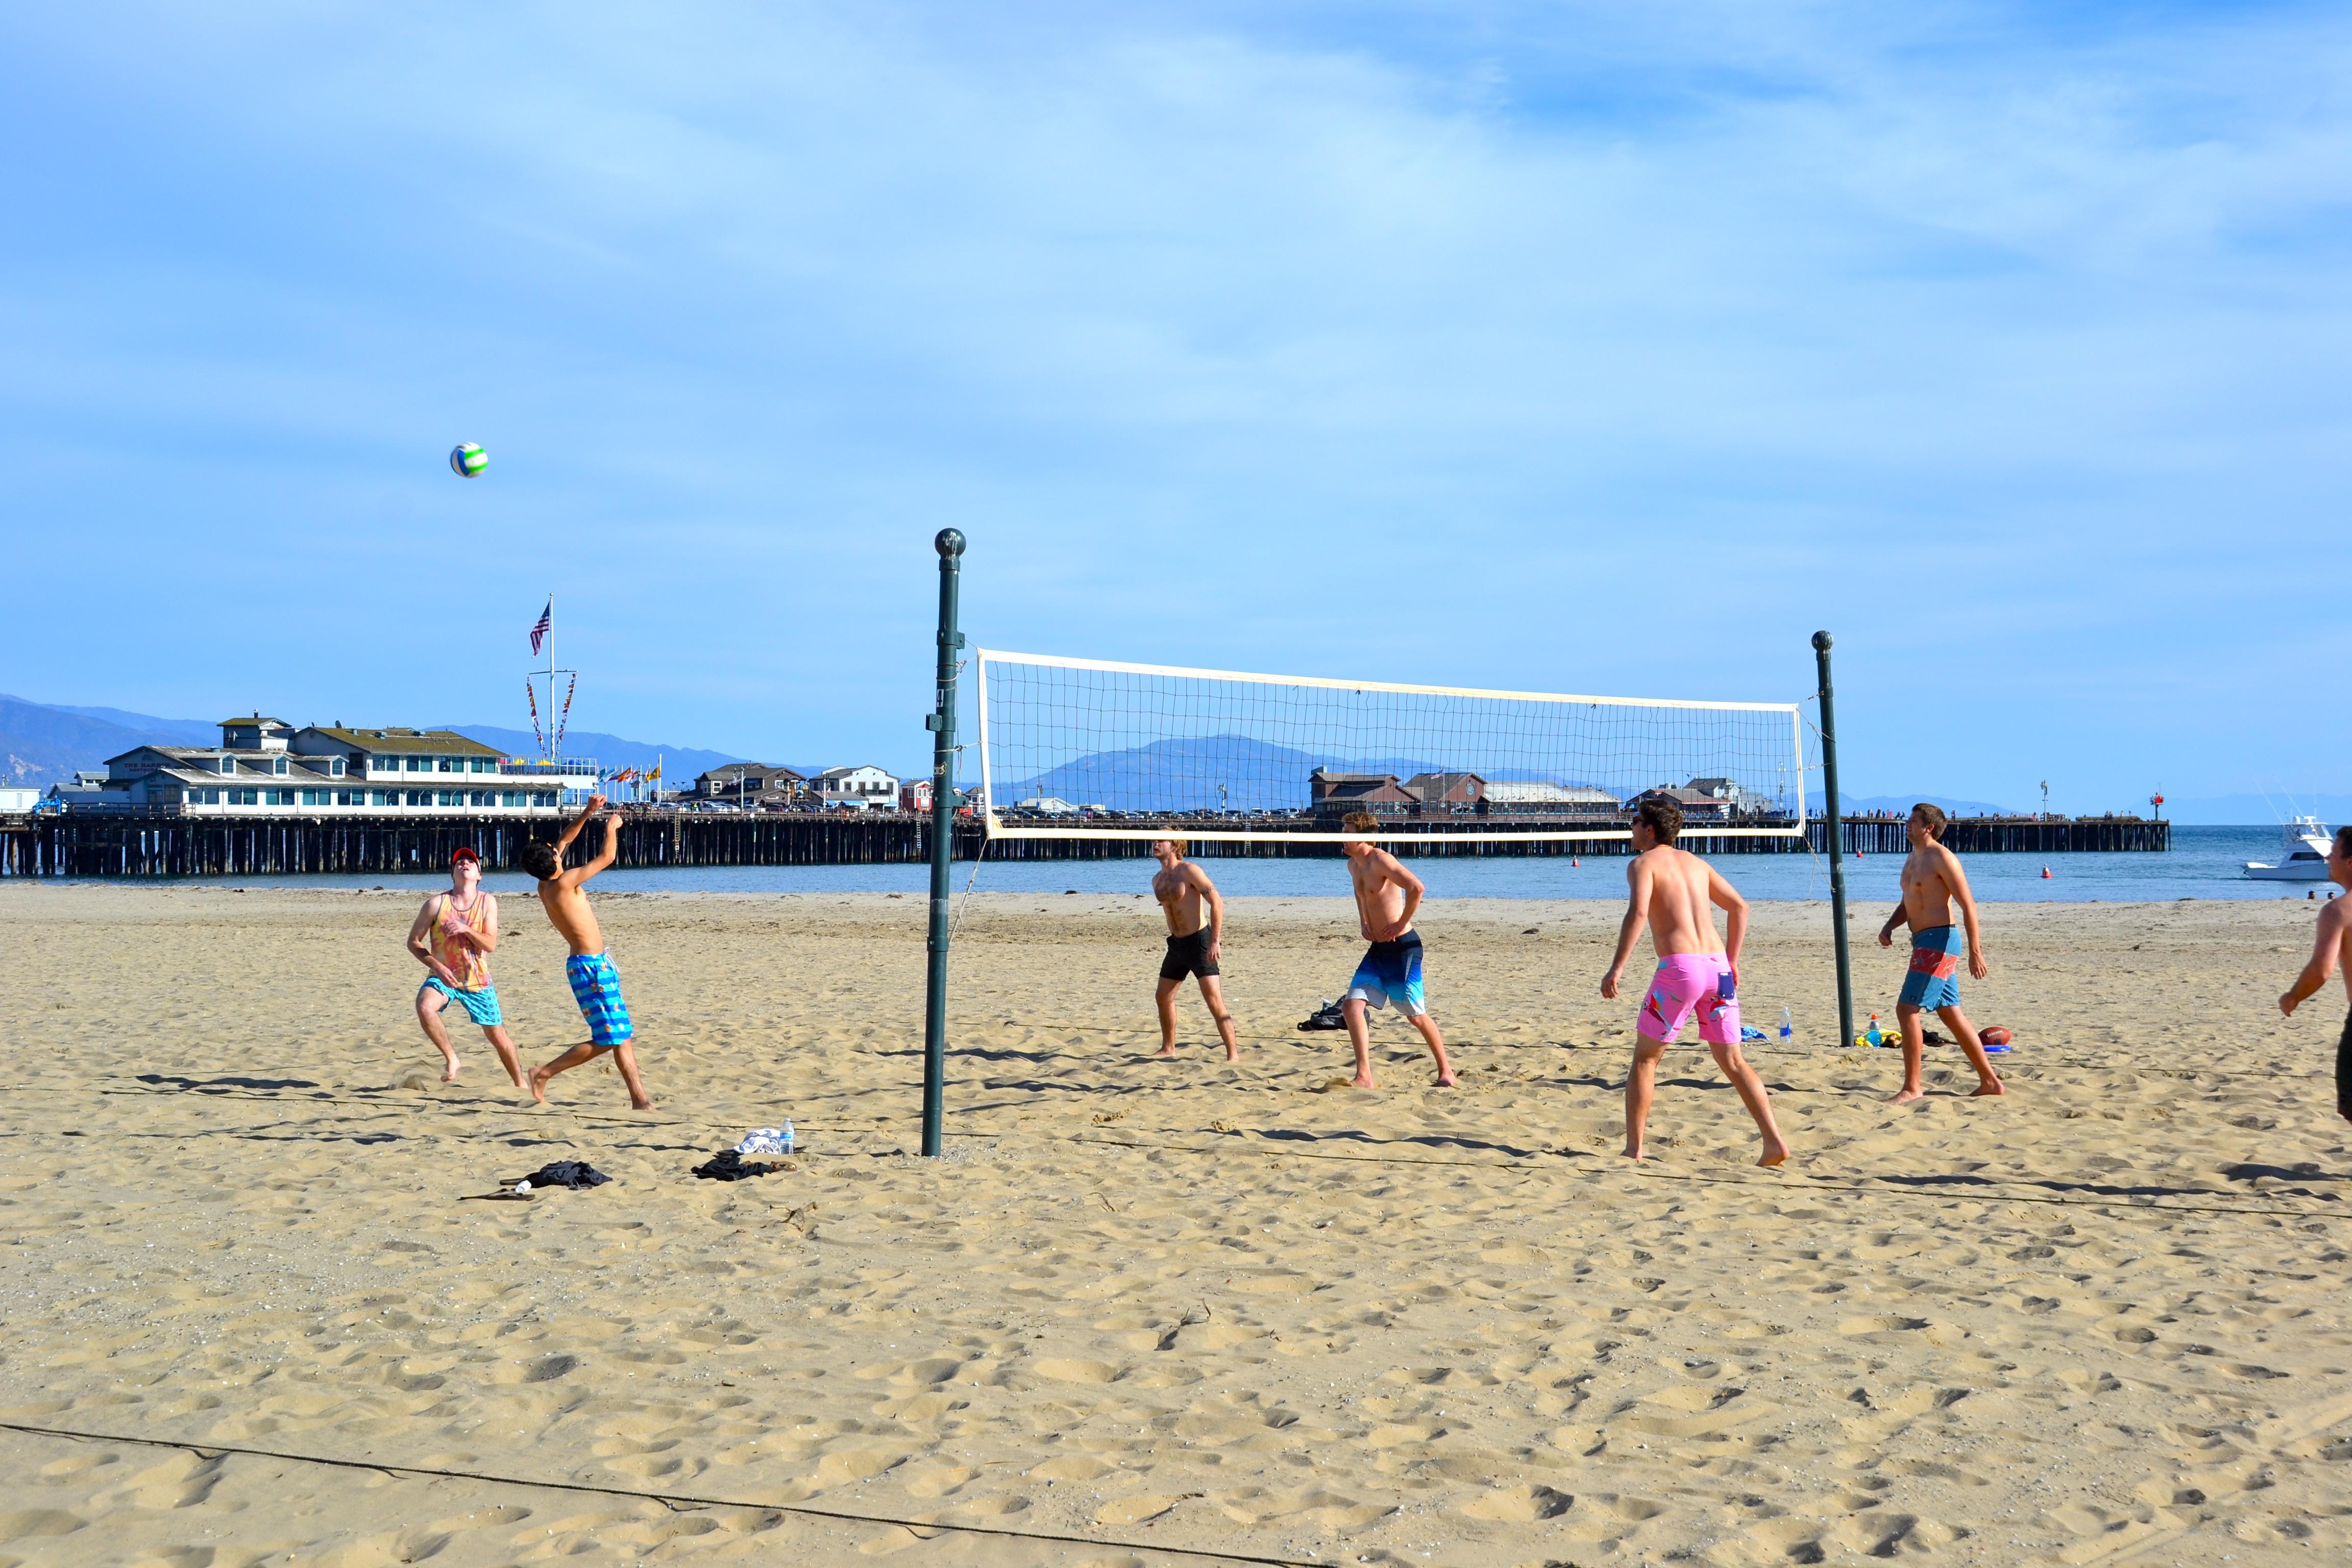 Santa Barbara Beach volleyball